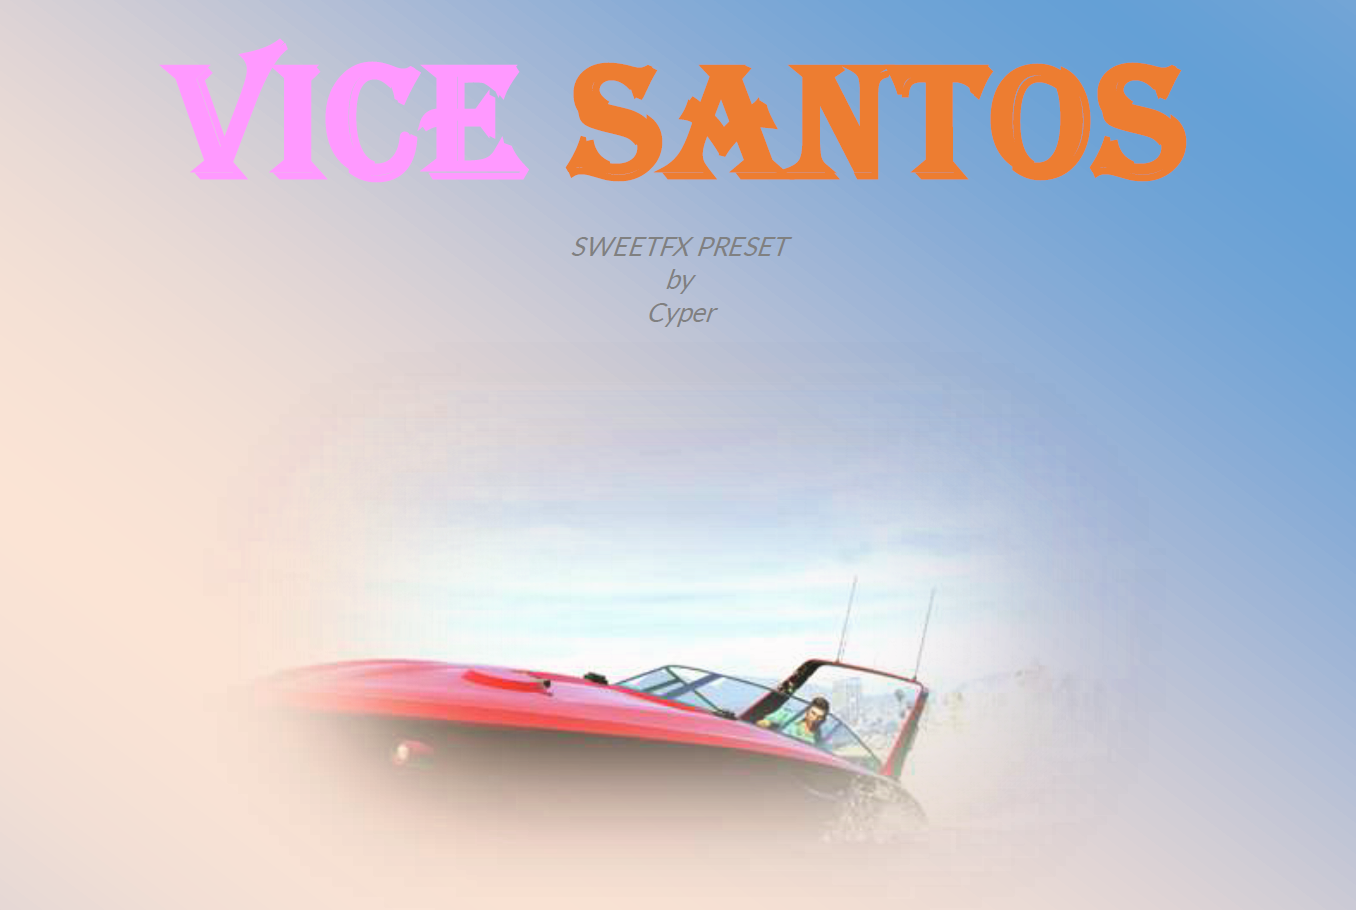 Vice Santos Preset (SweetFX & Reshade) - GTA5-Mods com